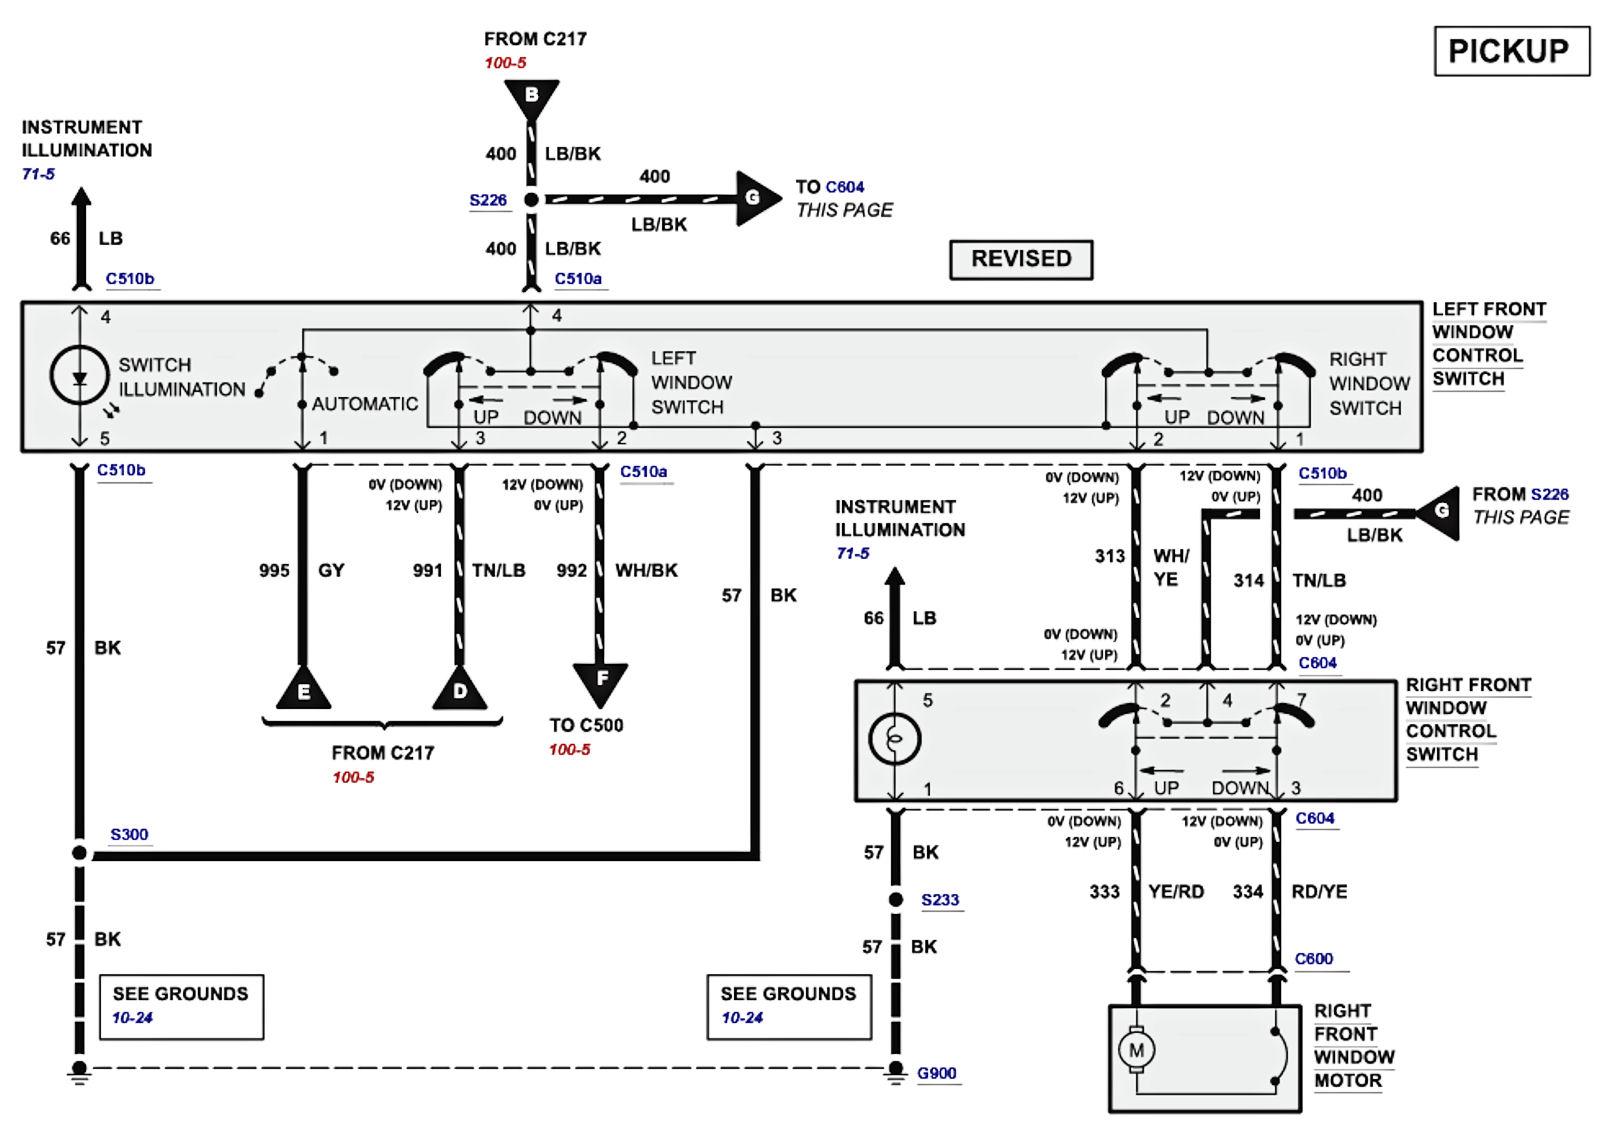 6bec8697-cd04-4680-9504-7435bcdf45ee_right front window motor circuit.jpg